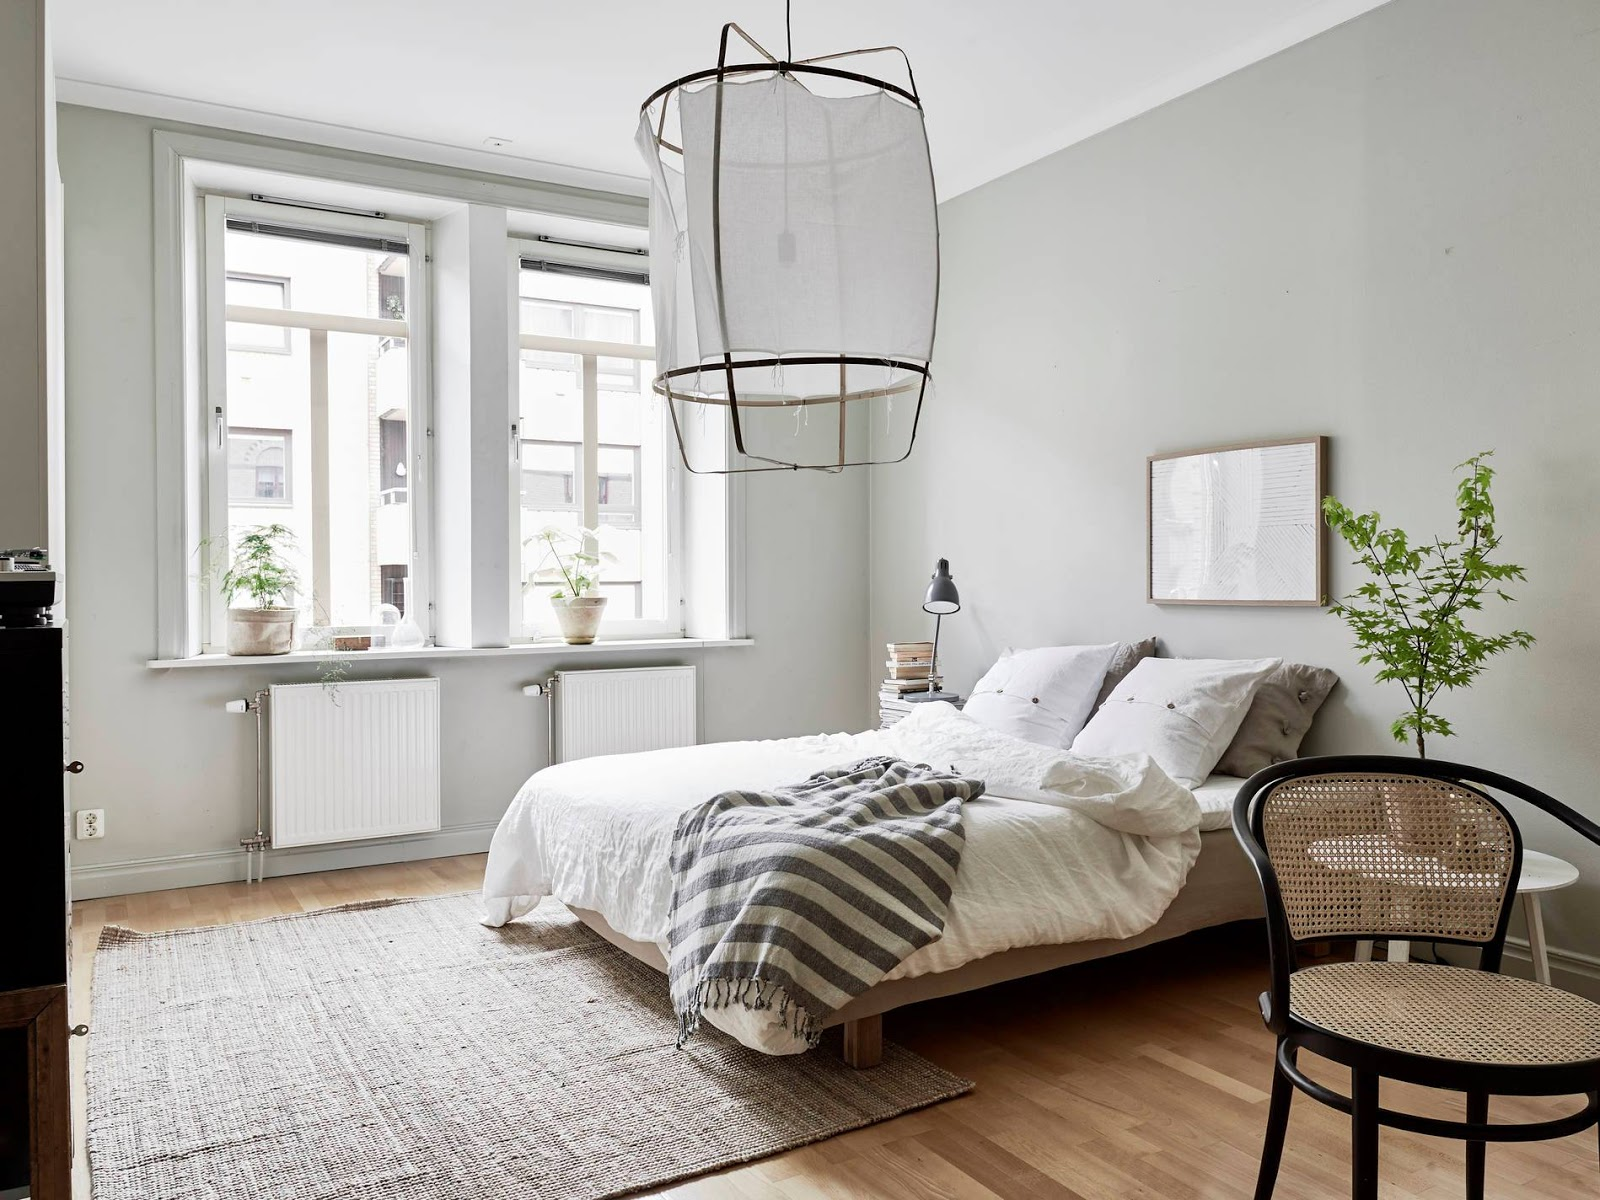 Two Bedroom Swedish Apartment